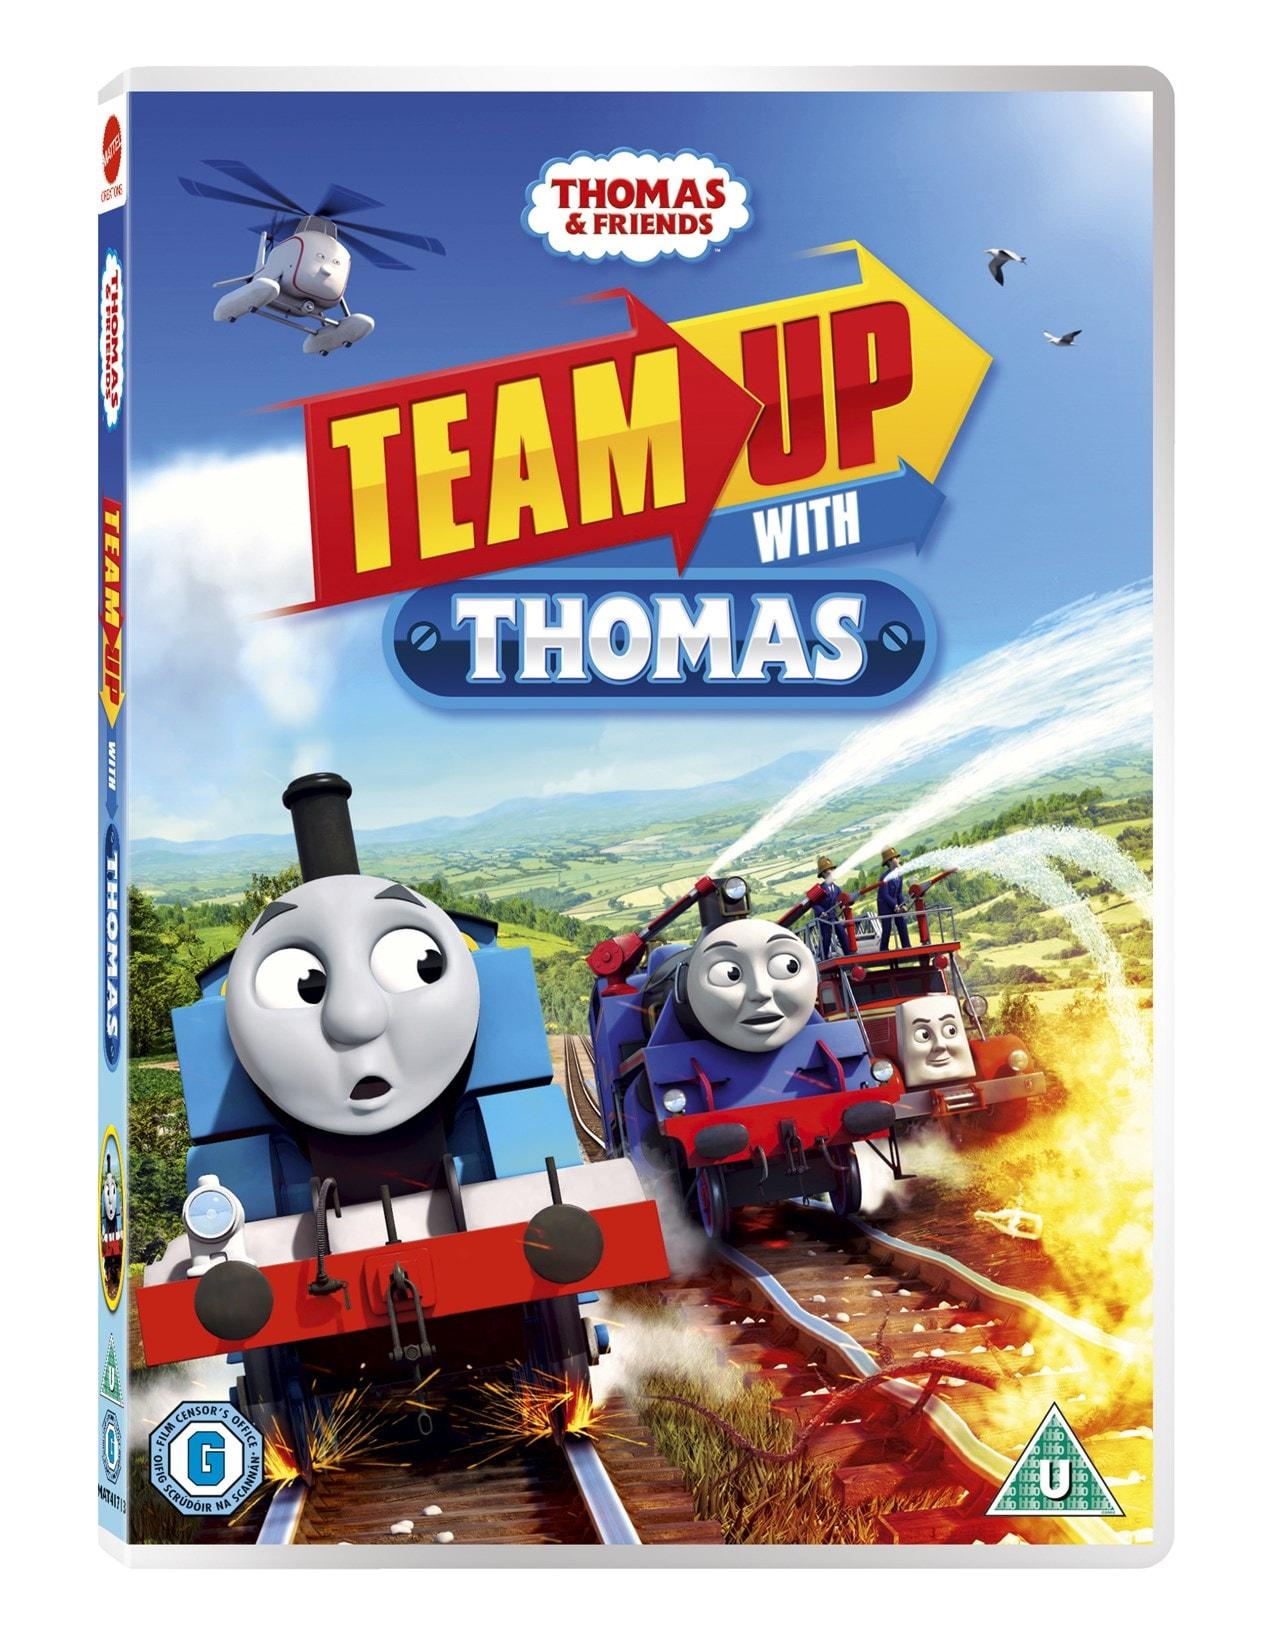 Thomas & Friends: Team Up With Thomas - 2